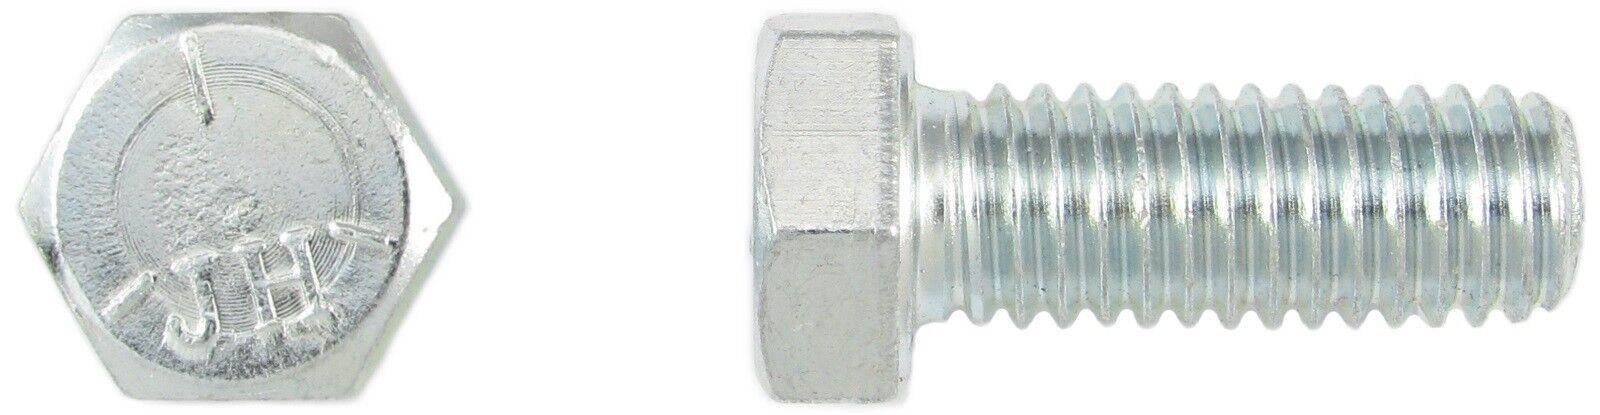 Sechskantschraube 7 16-14 UNC x 7 8 Grade 5 verzinkt - Hex Head Cap Screw (FT)